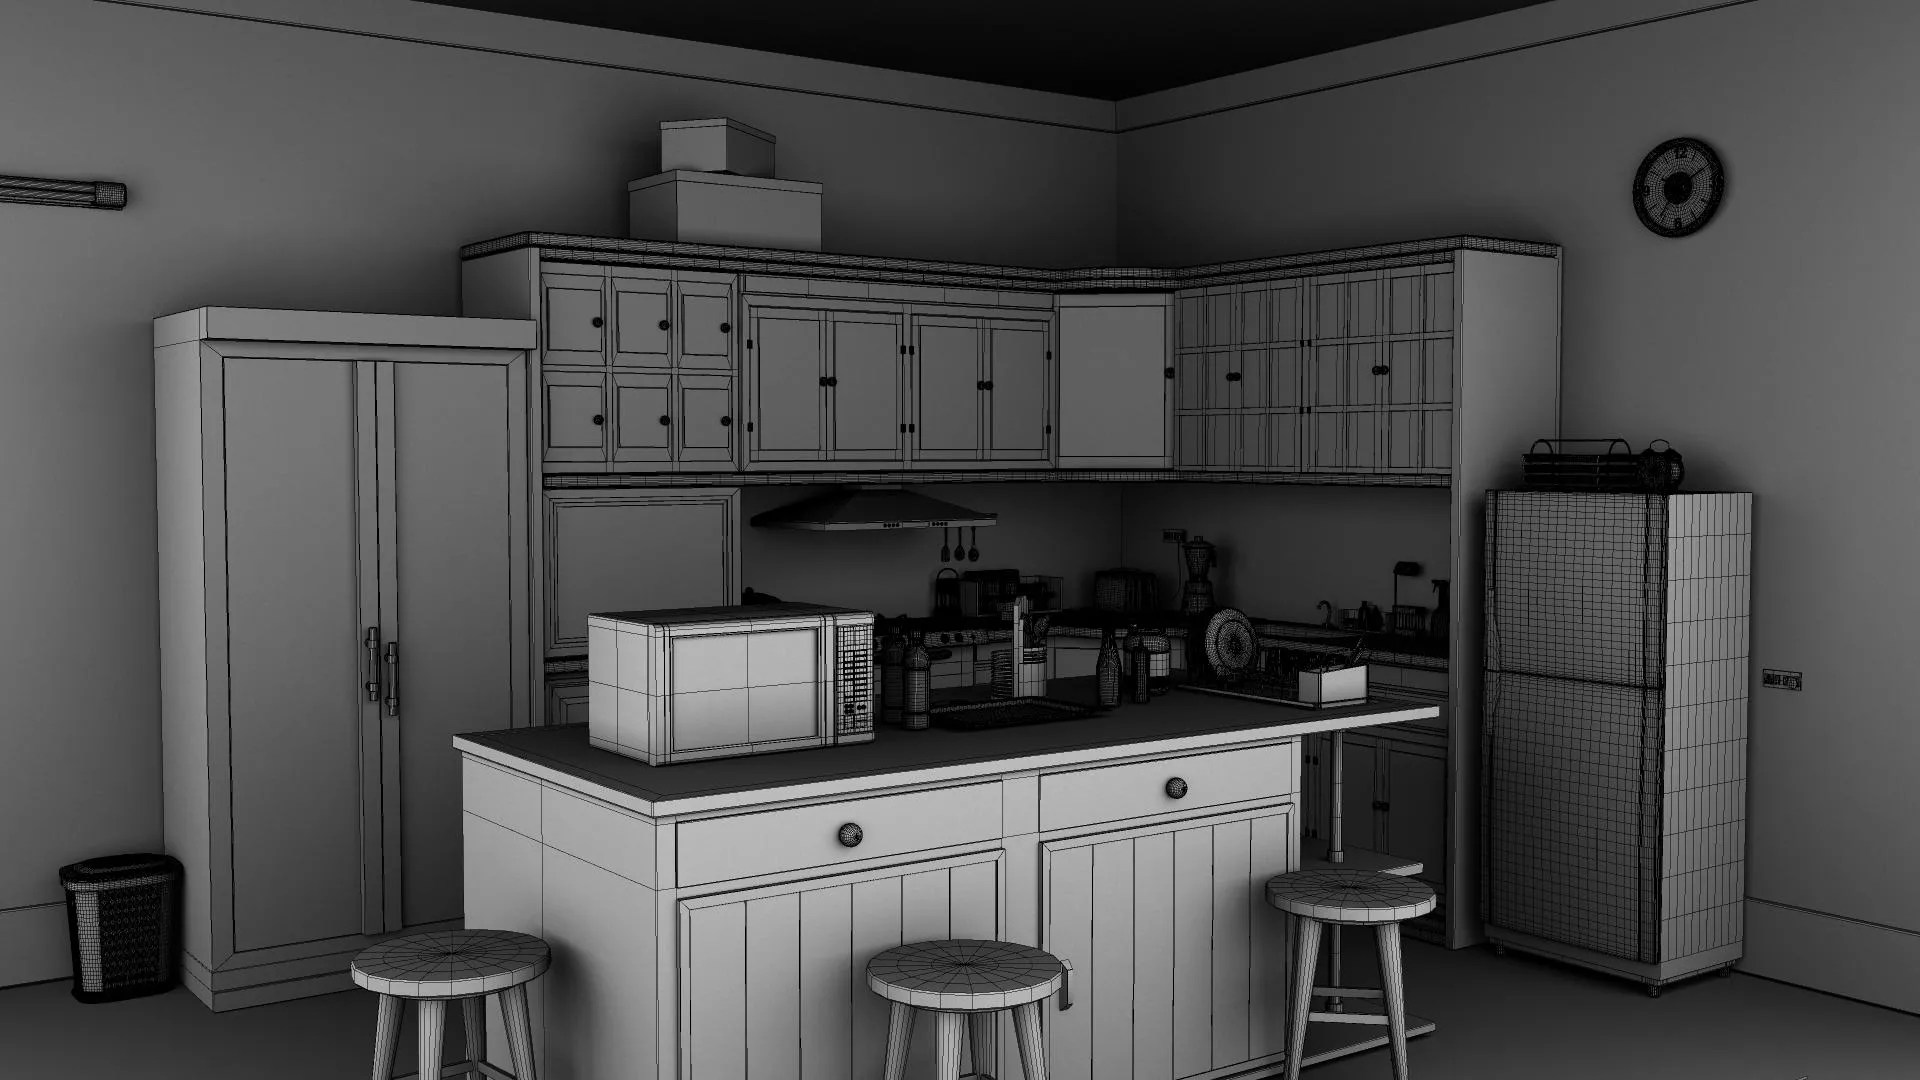 Kitchen 3D Model | FlatPyramid on Model Kitchen  id=25218